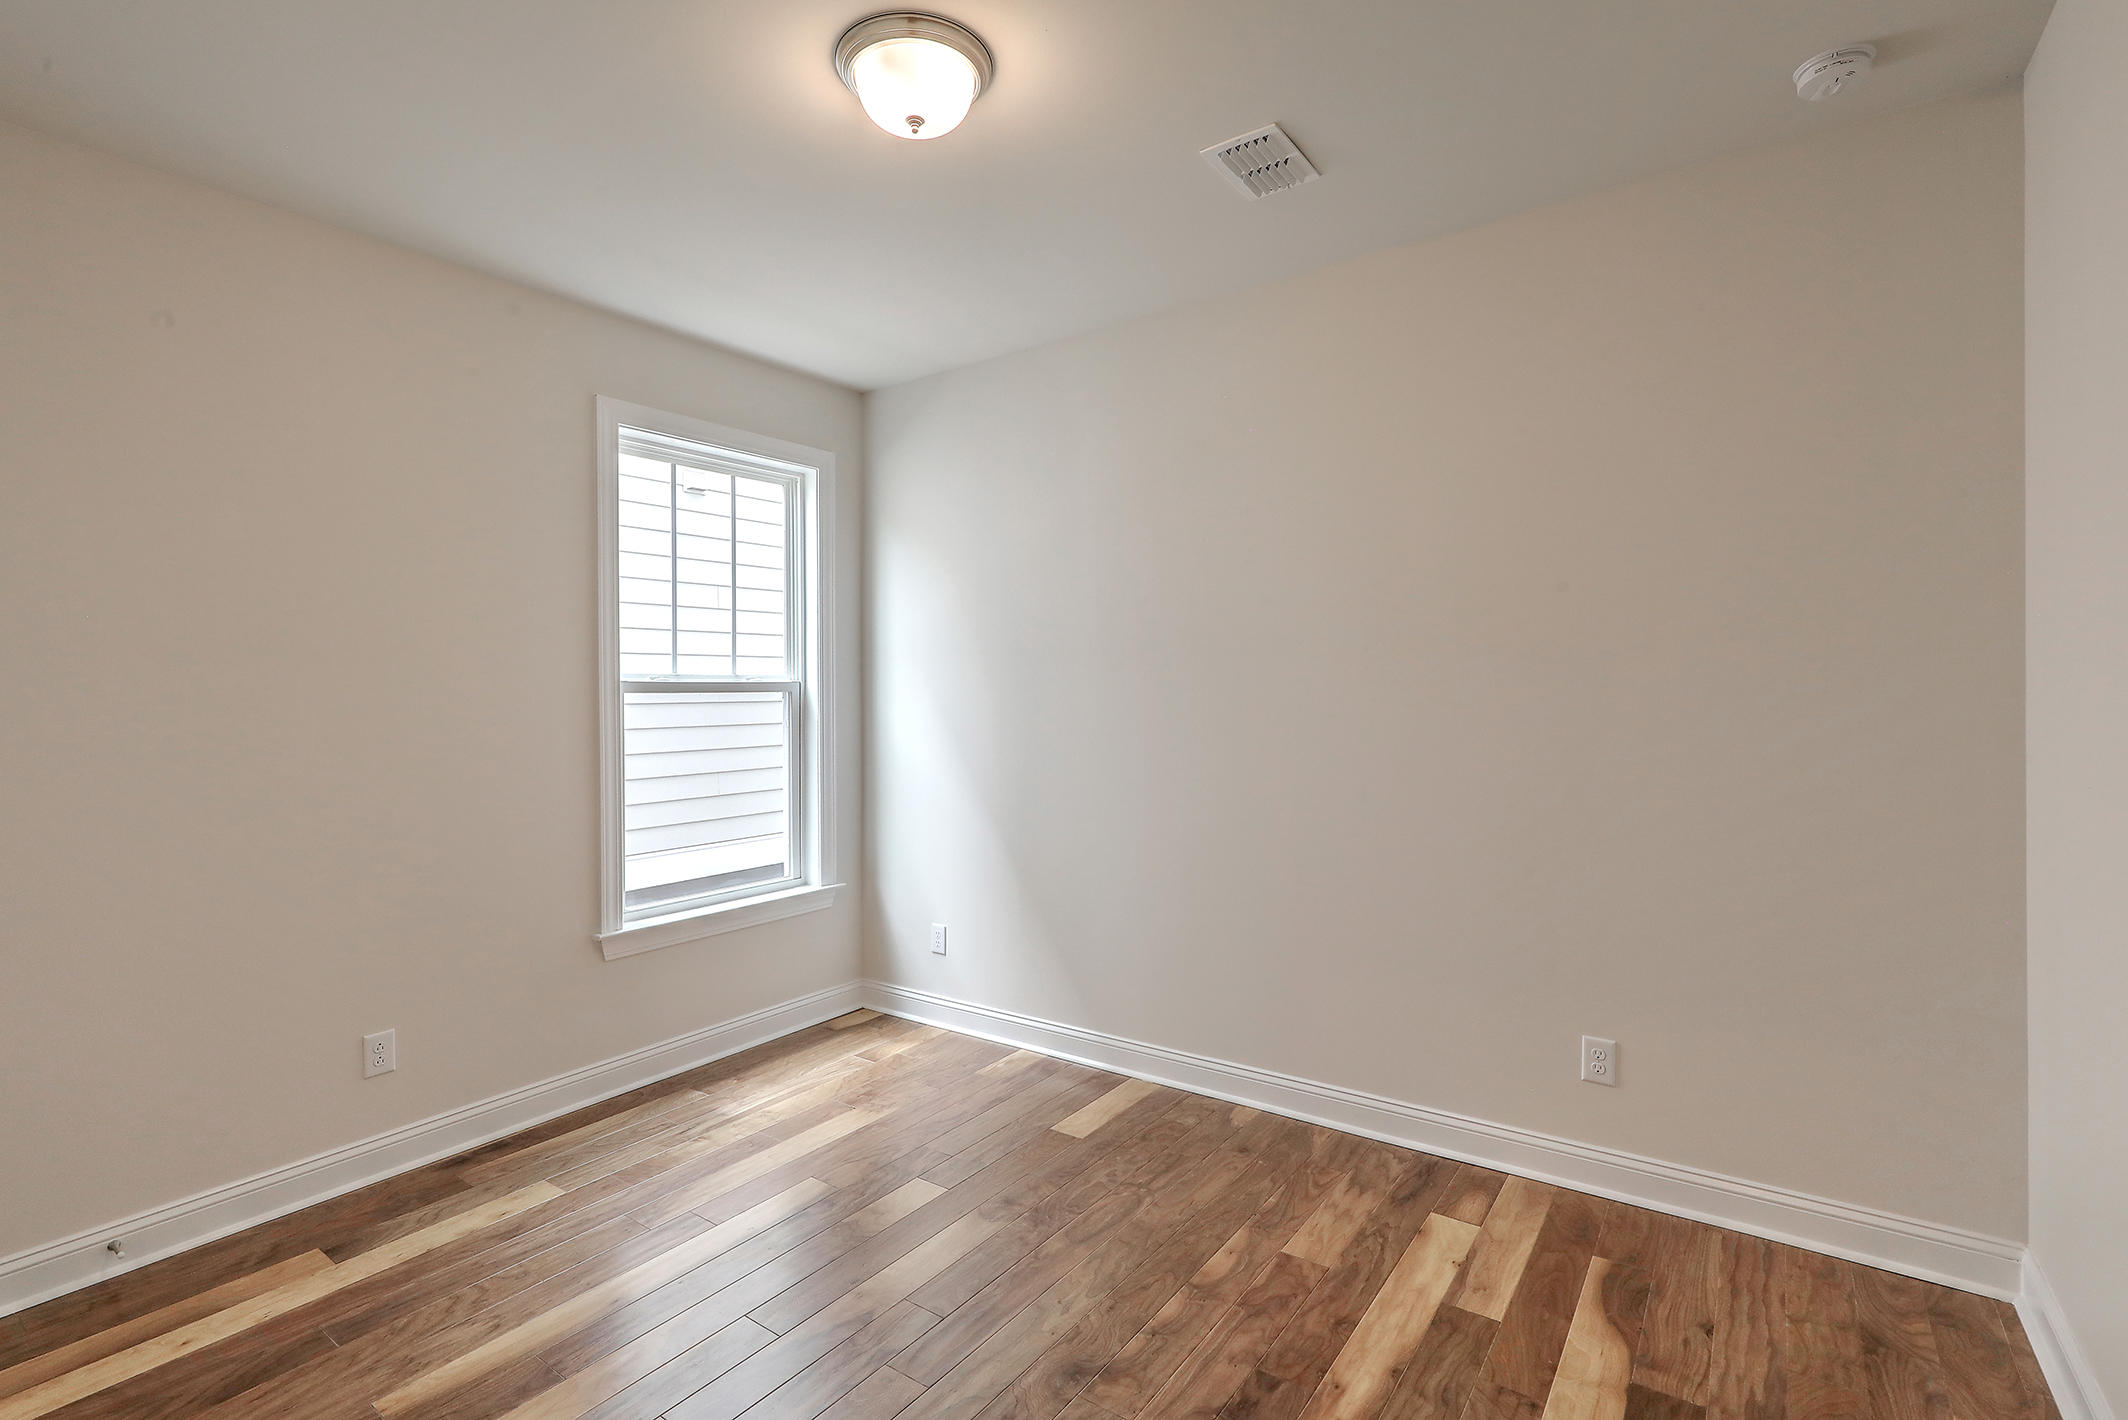 Bentley Park Homes For Sale - 1277 Gannett, Mount Pleasant, SC - 11